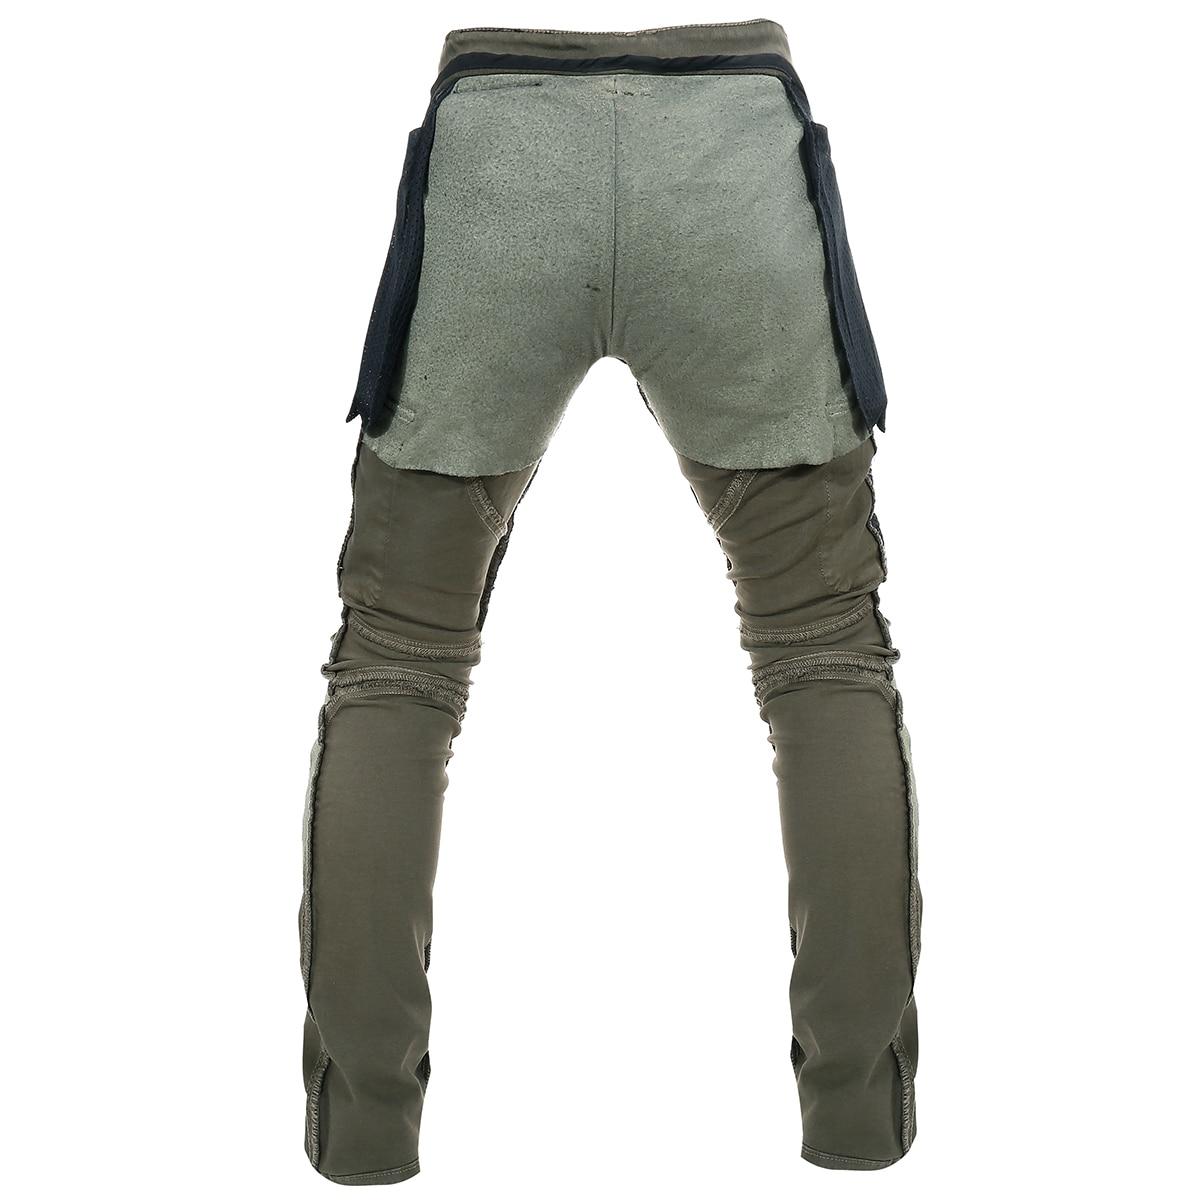 Men Women Motorcycle Riding Jeans Protective Pants Knight Hockey Biker Armor Pants XXL=36, Black